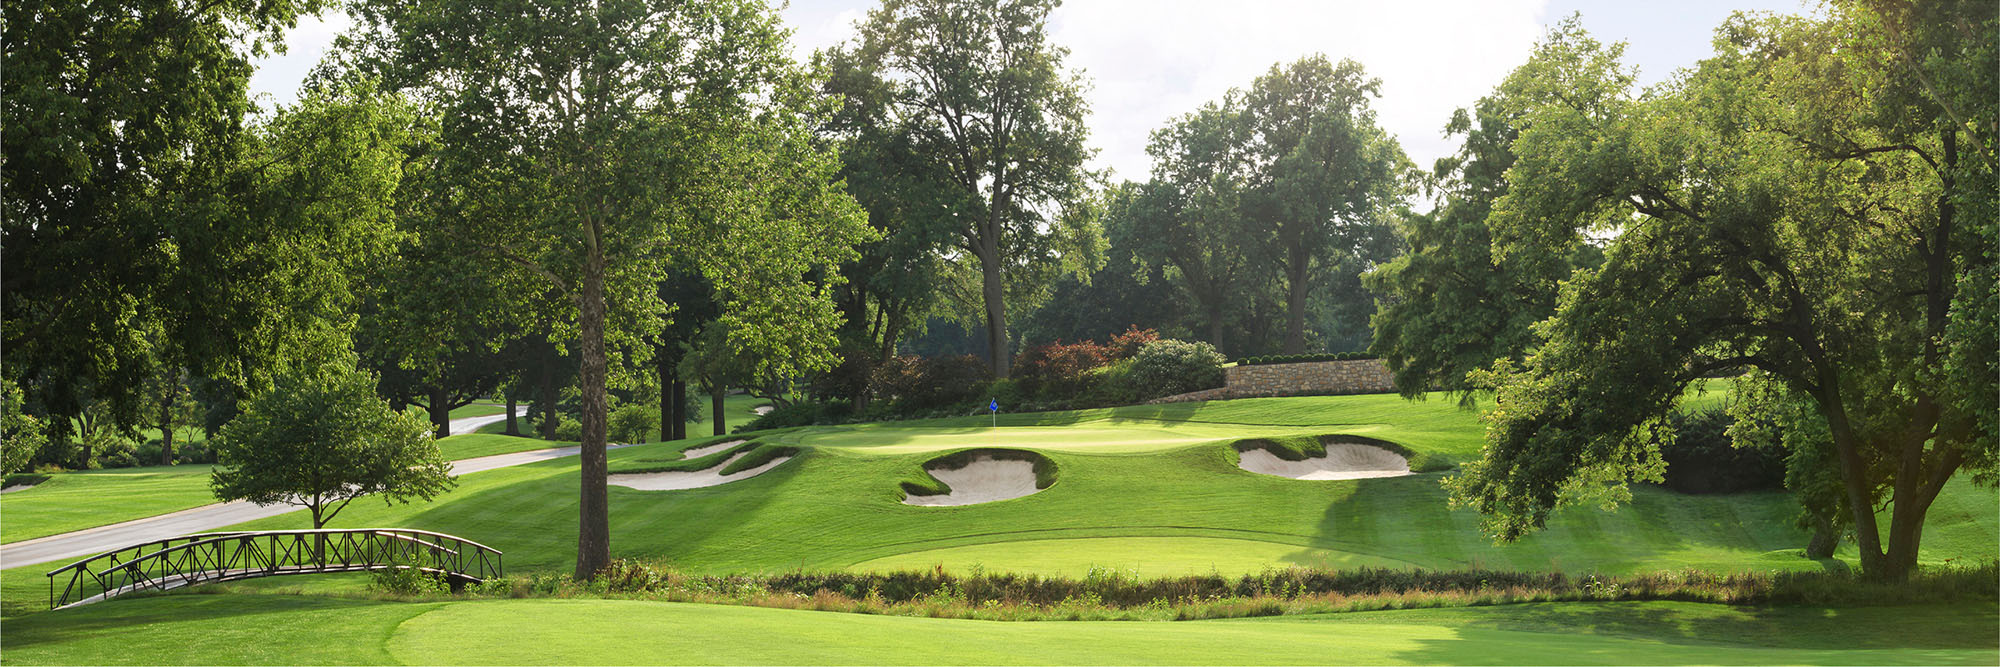 Golf Course Image - Mission Hills No. 15